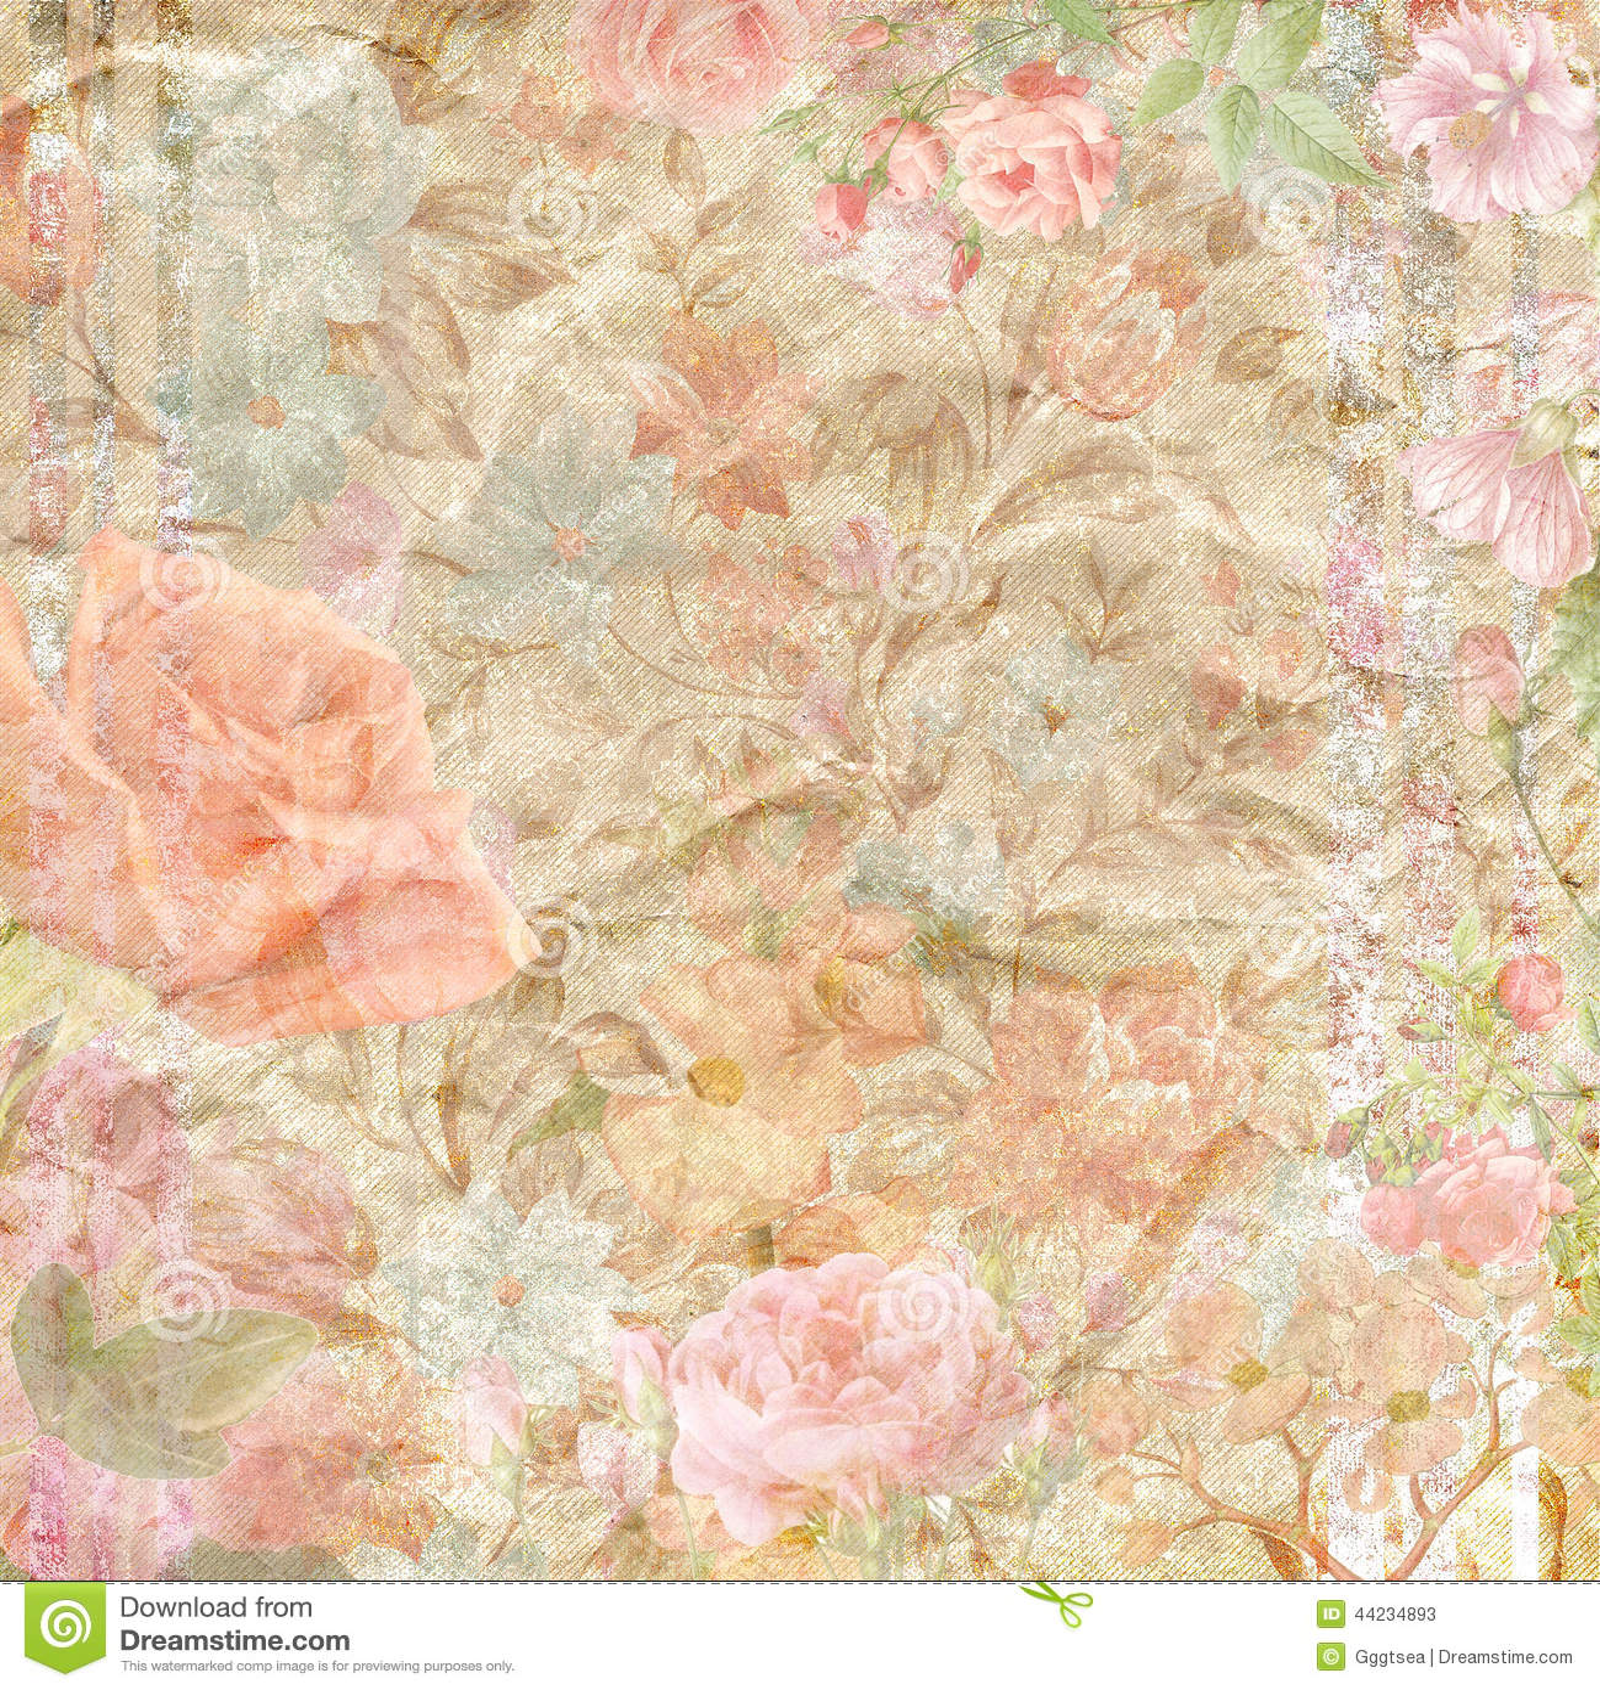 Scrapbook paper images - Floral Scrapbook Paper Background